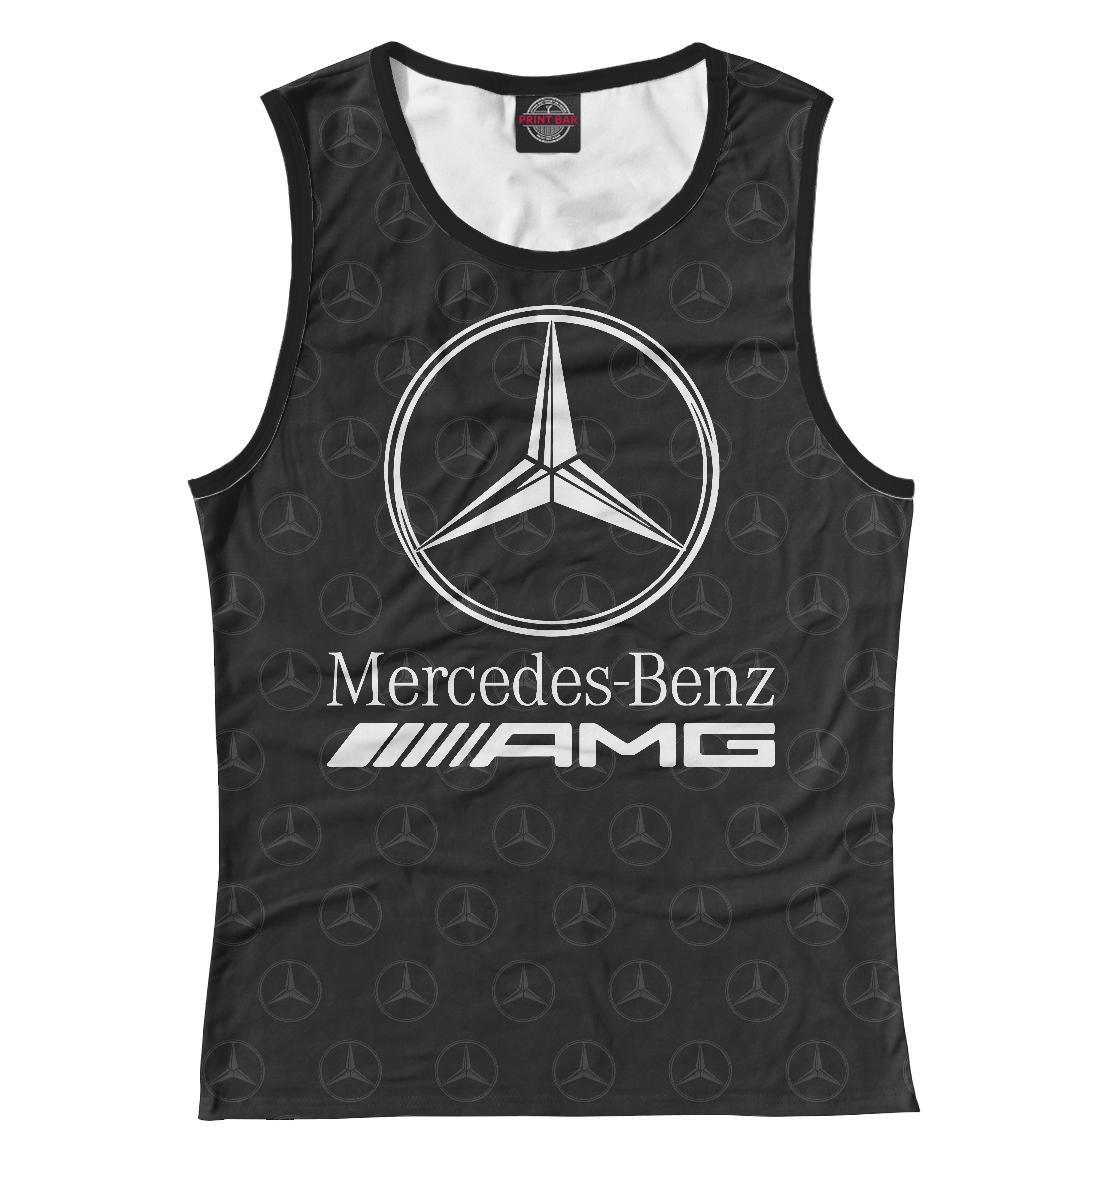 Купить Mercedes-Benz AMG Premium, Printbar, Майки, MER-425413-may-1